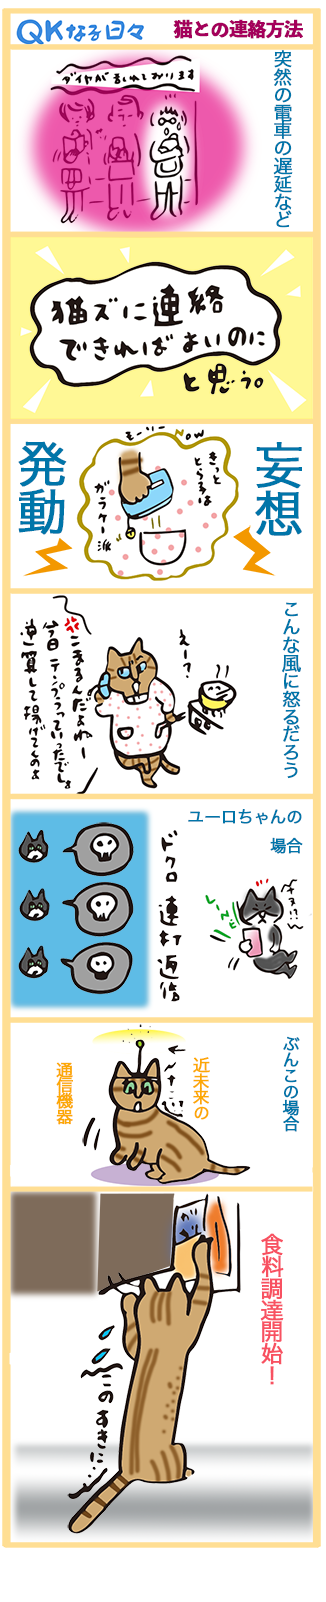 qk manga18